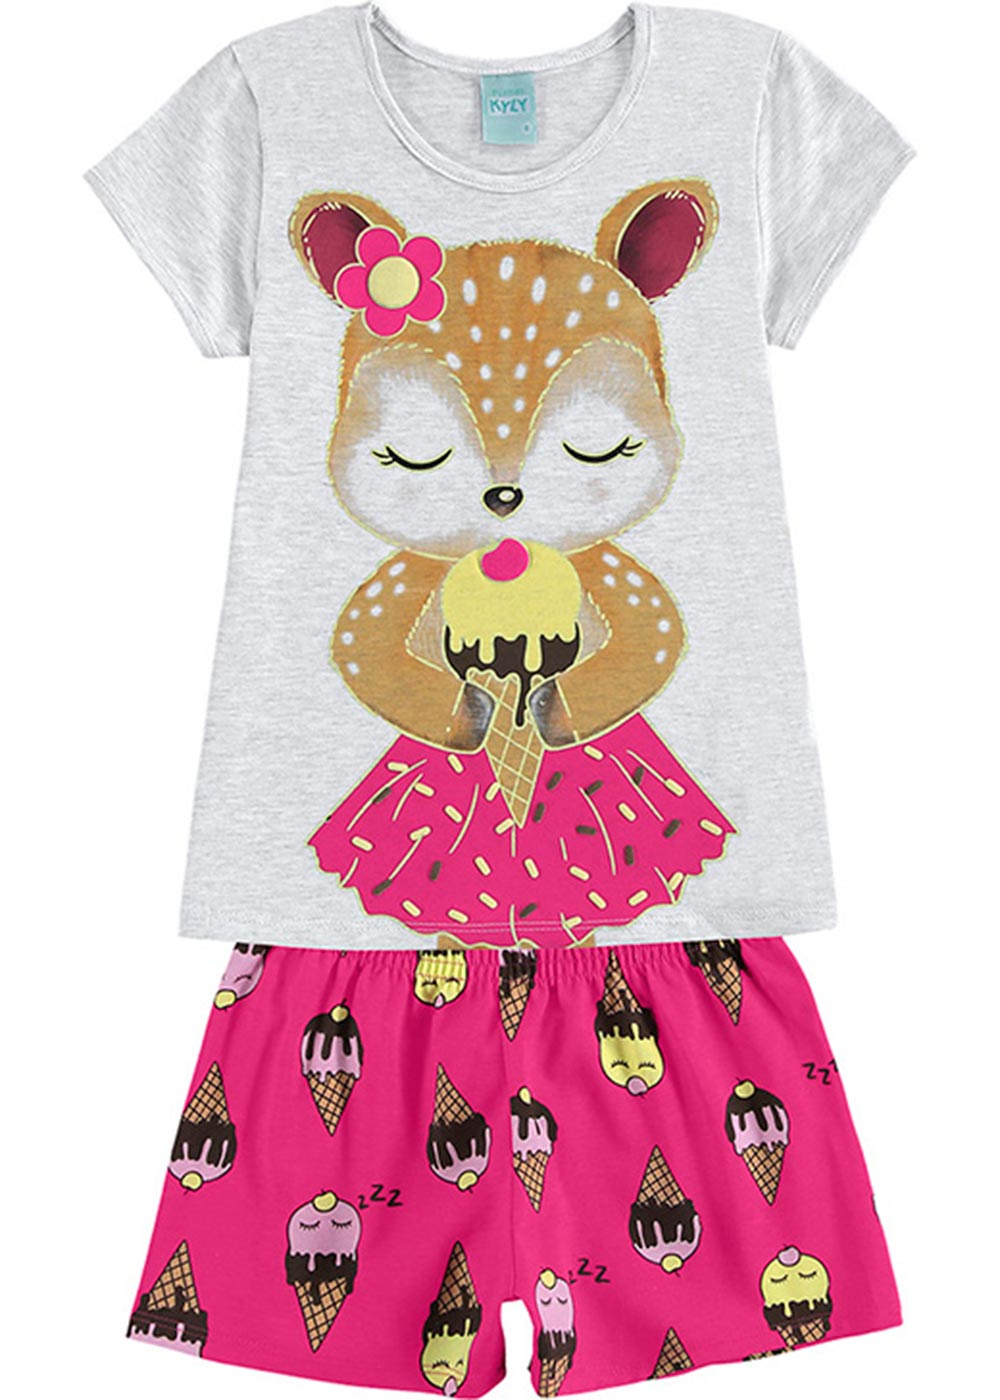 Pijama Infantil Feminino Verão Branco Ice Cream Dream - Kyly